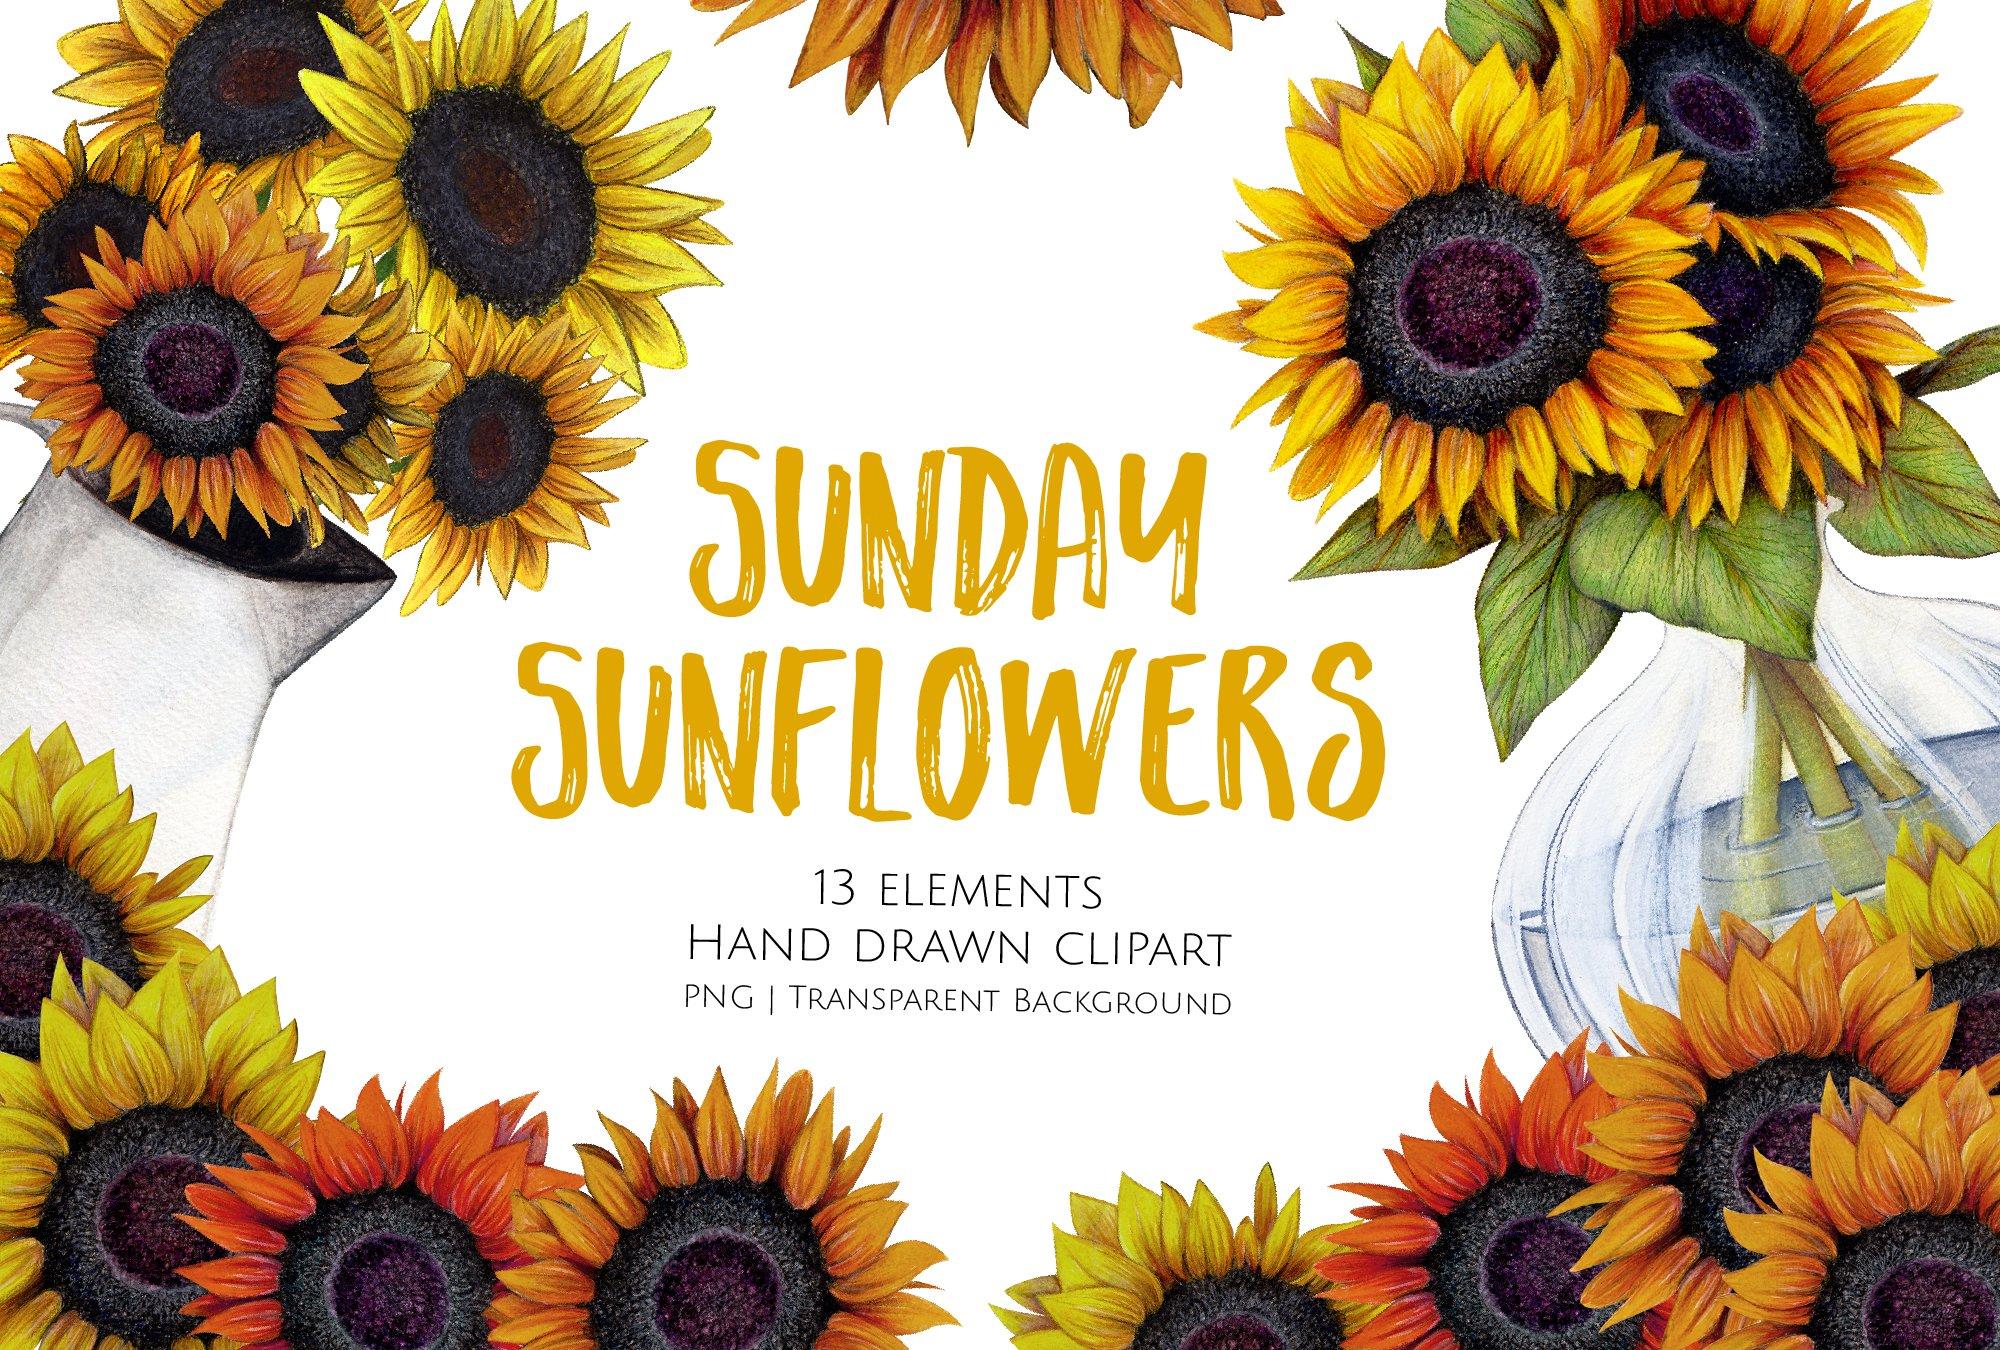 Sunday sunflowers hand drawn clipart illustrations creative market fandeluxe PDF